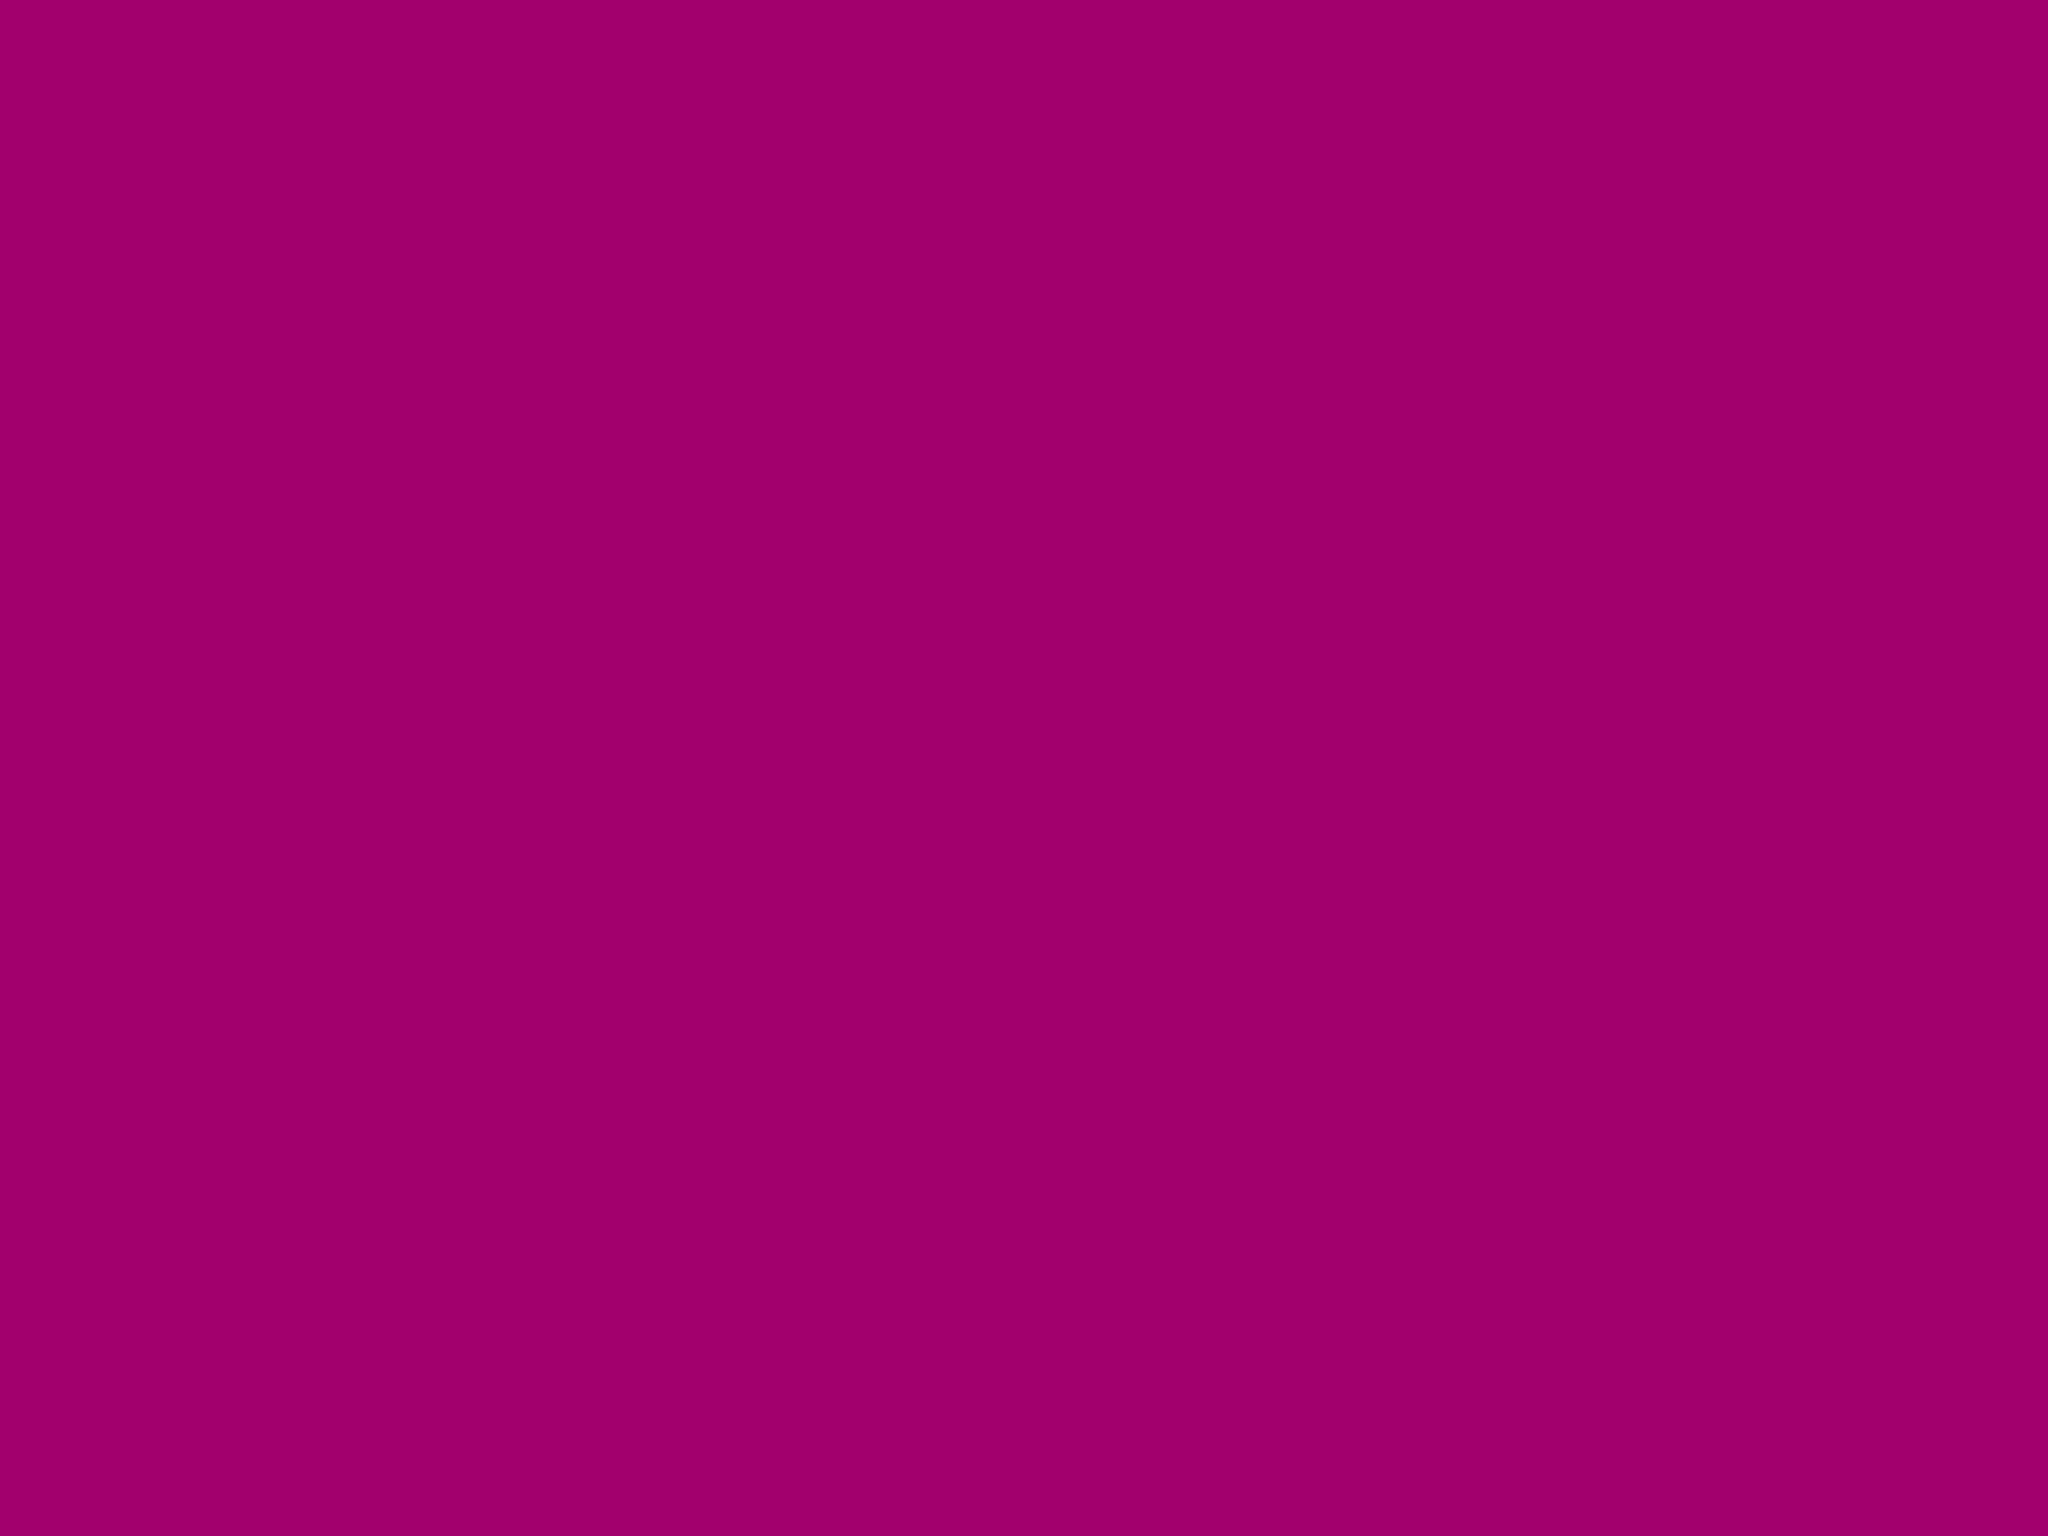 2048x1536 Flirt Solid Color Background